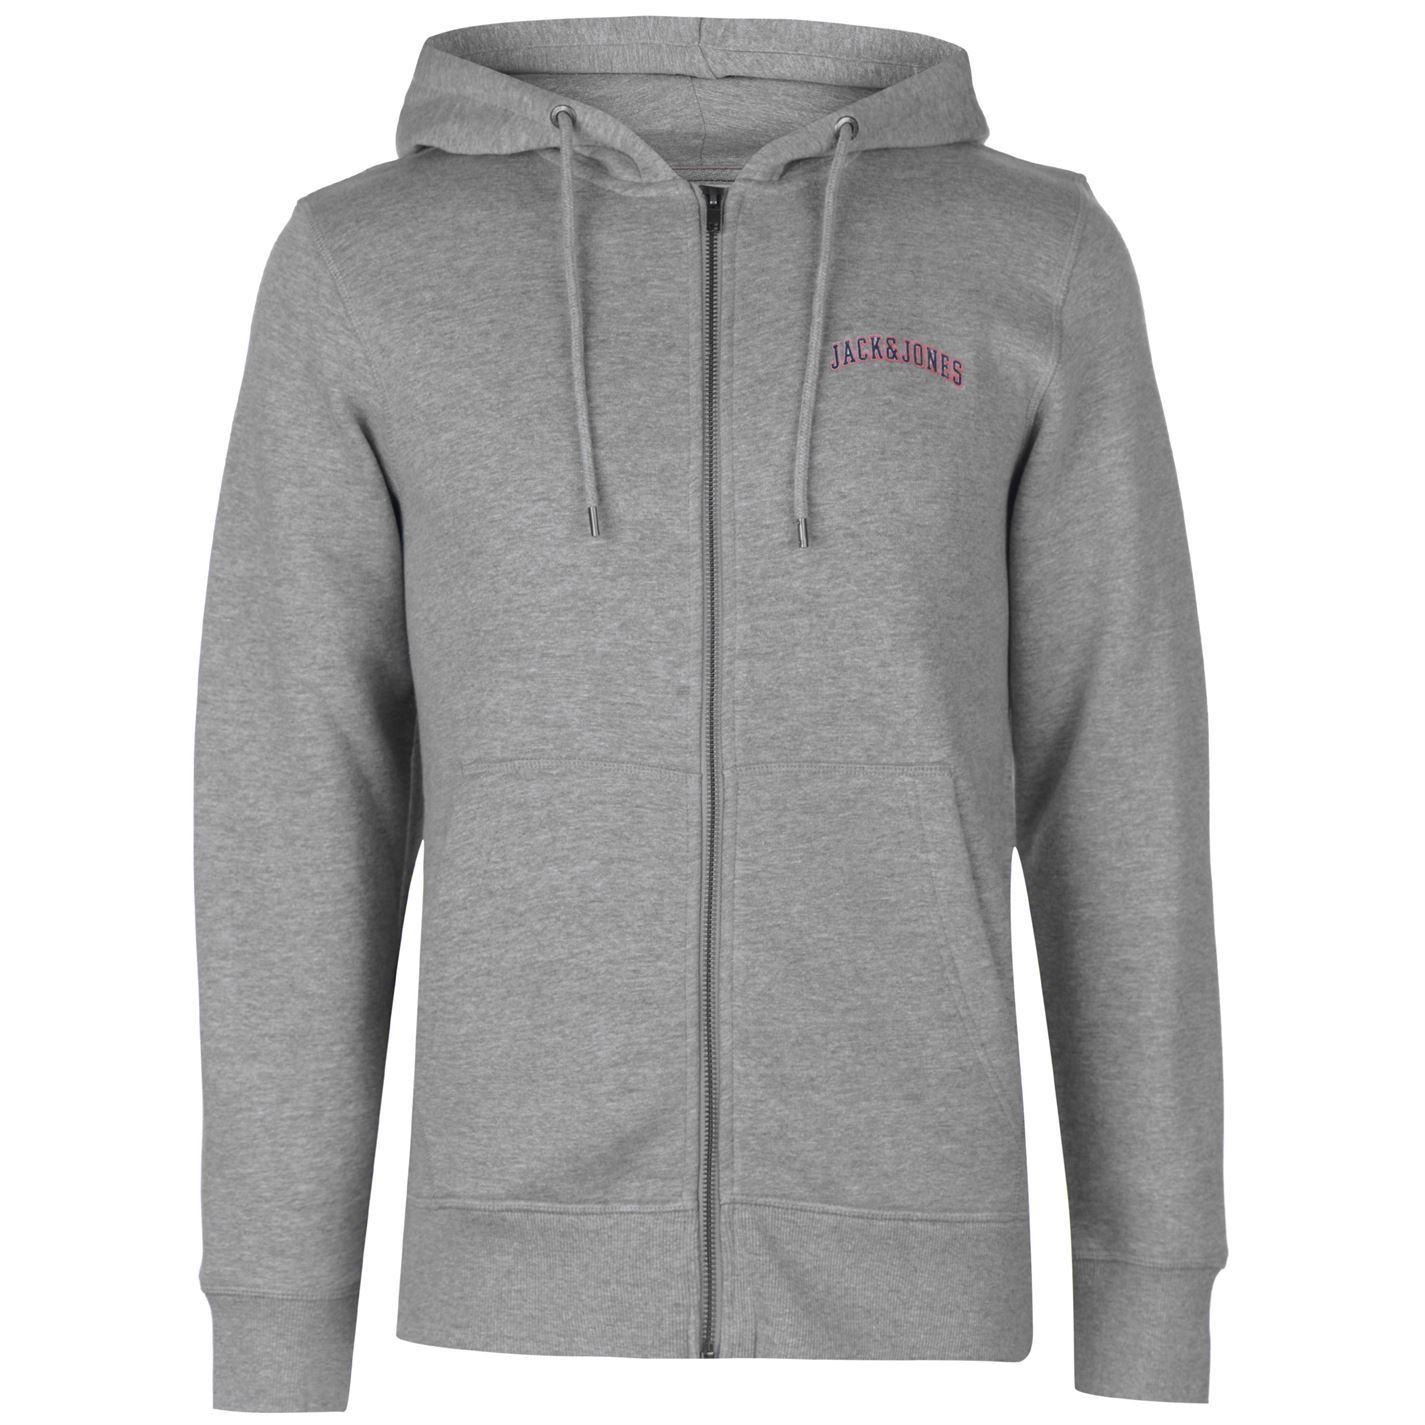 Jack-and-Jones-Originals-Harvey-Zip-Hoodie-Mens-Hooded-Top-Sweater-Outerwear thumbnail 5